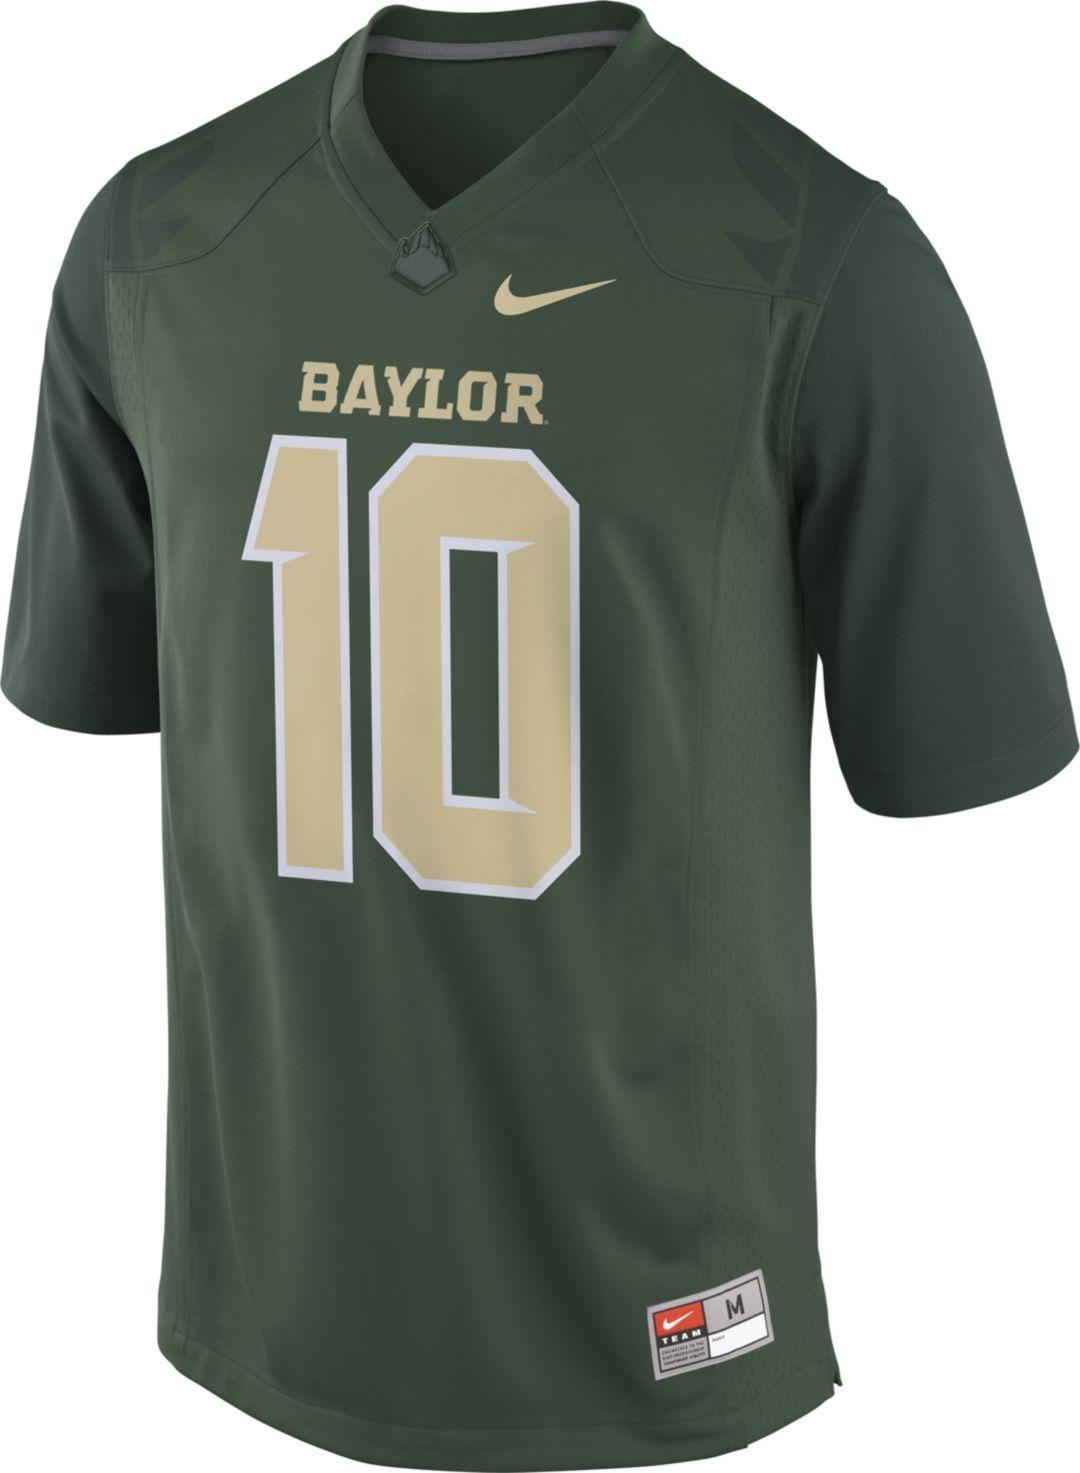 46bce69642d Nike Men's Robert Griffin III Baylor Bears #10 Green Replica College Alumni  Jersey 2